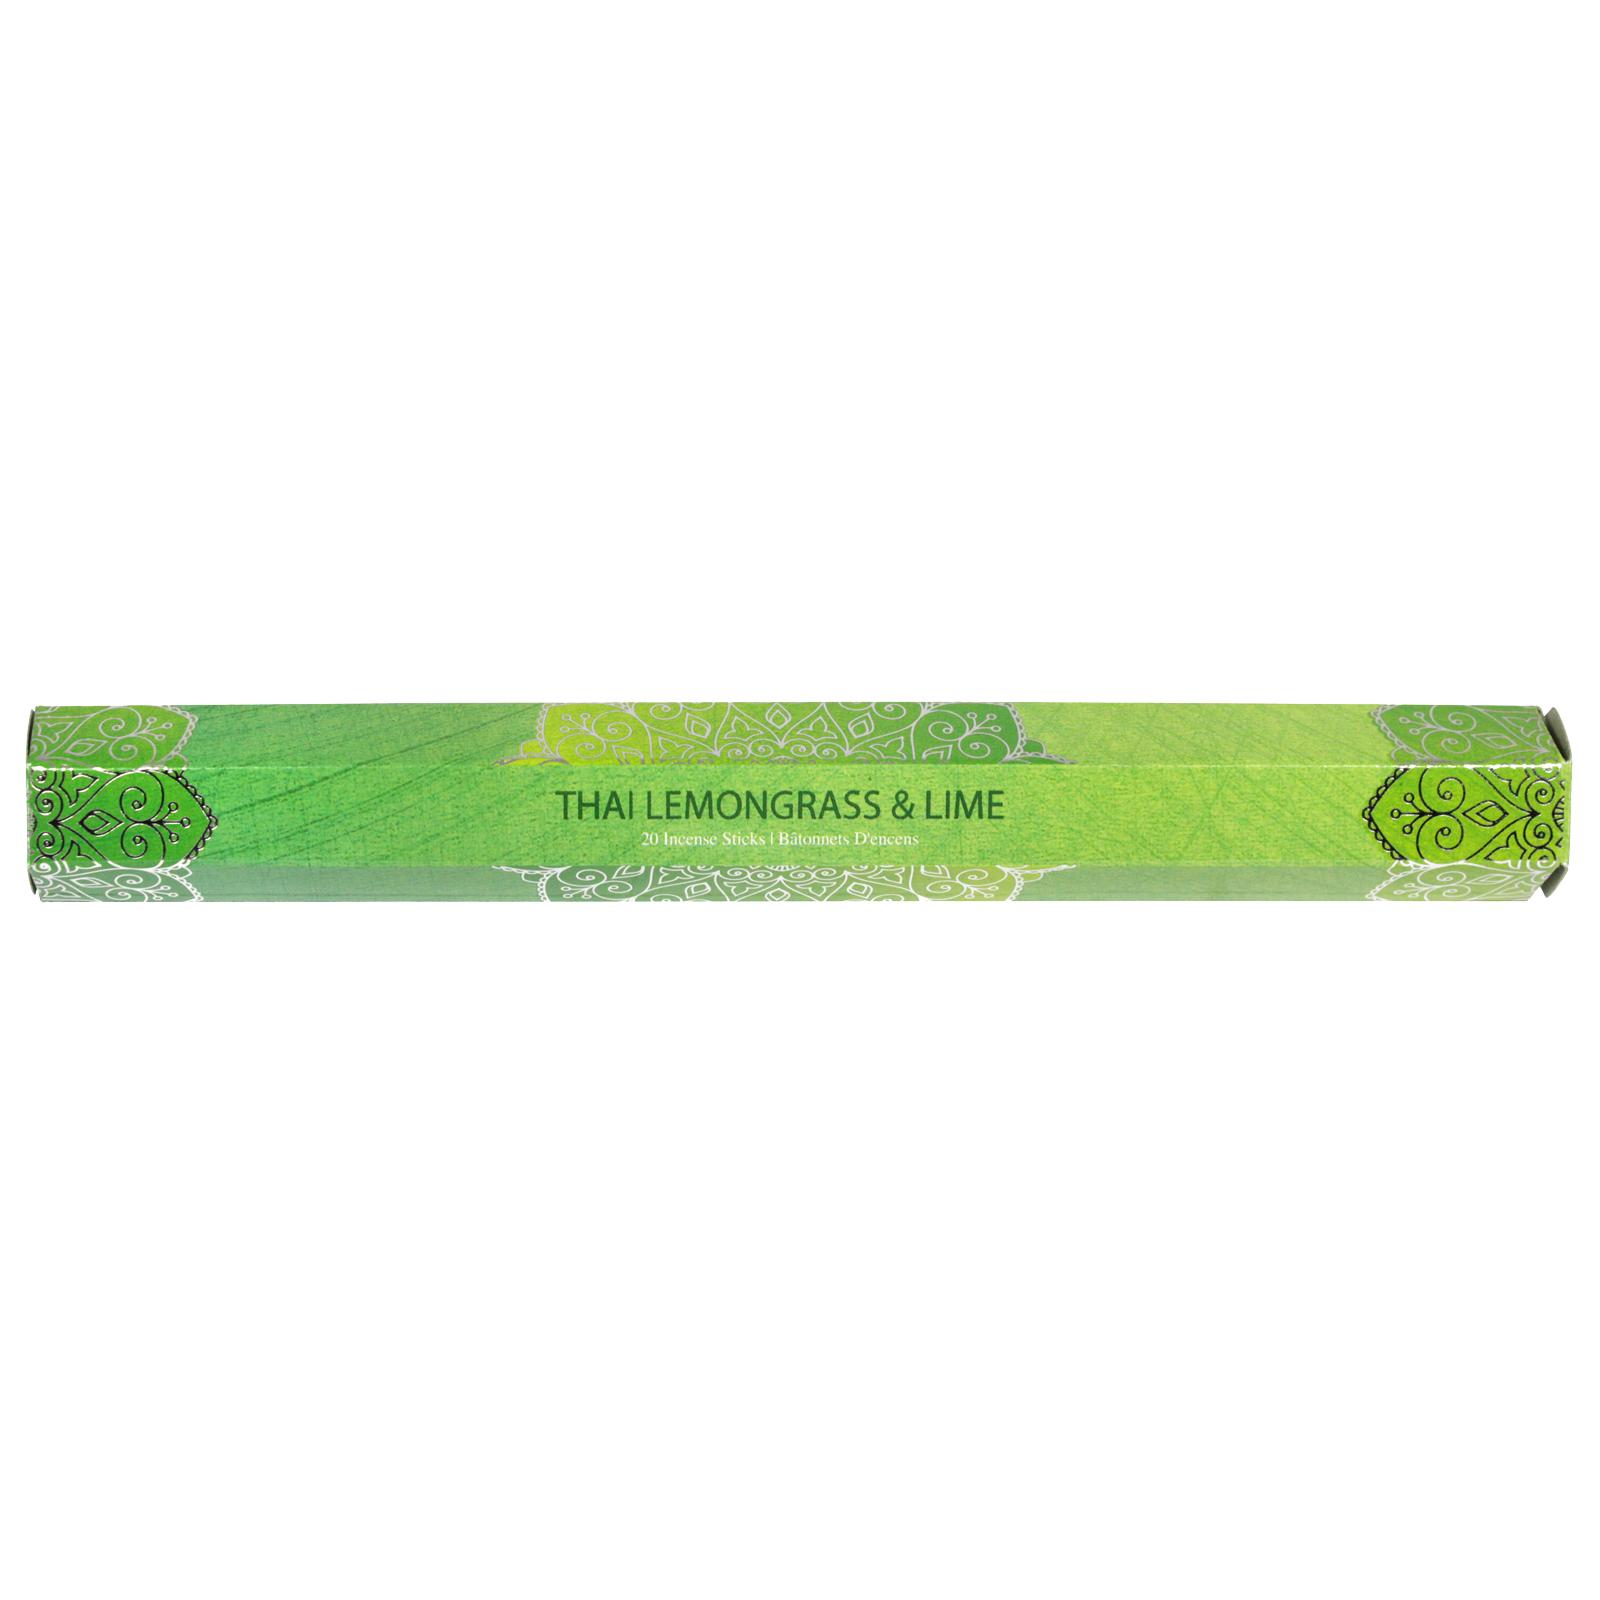 SIL INCENSE STICKS 20PK THAI LEMON GRASS+LIME